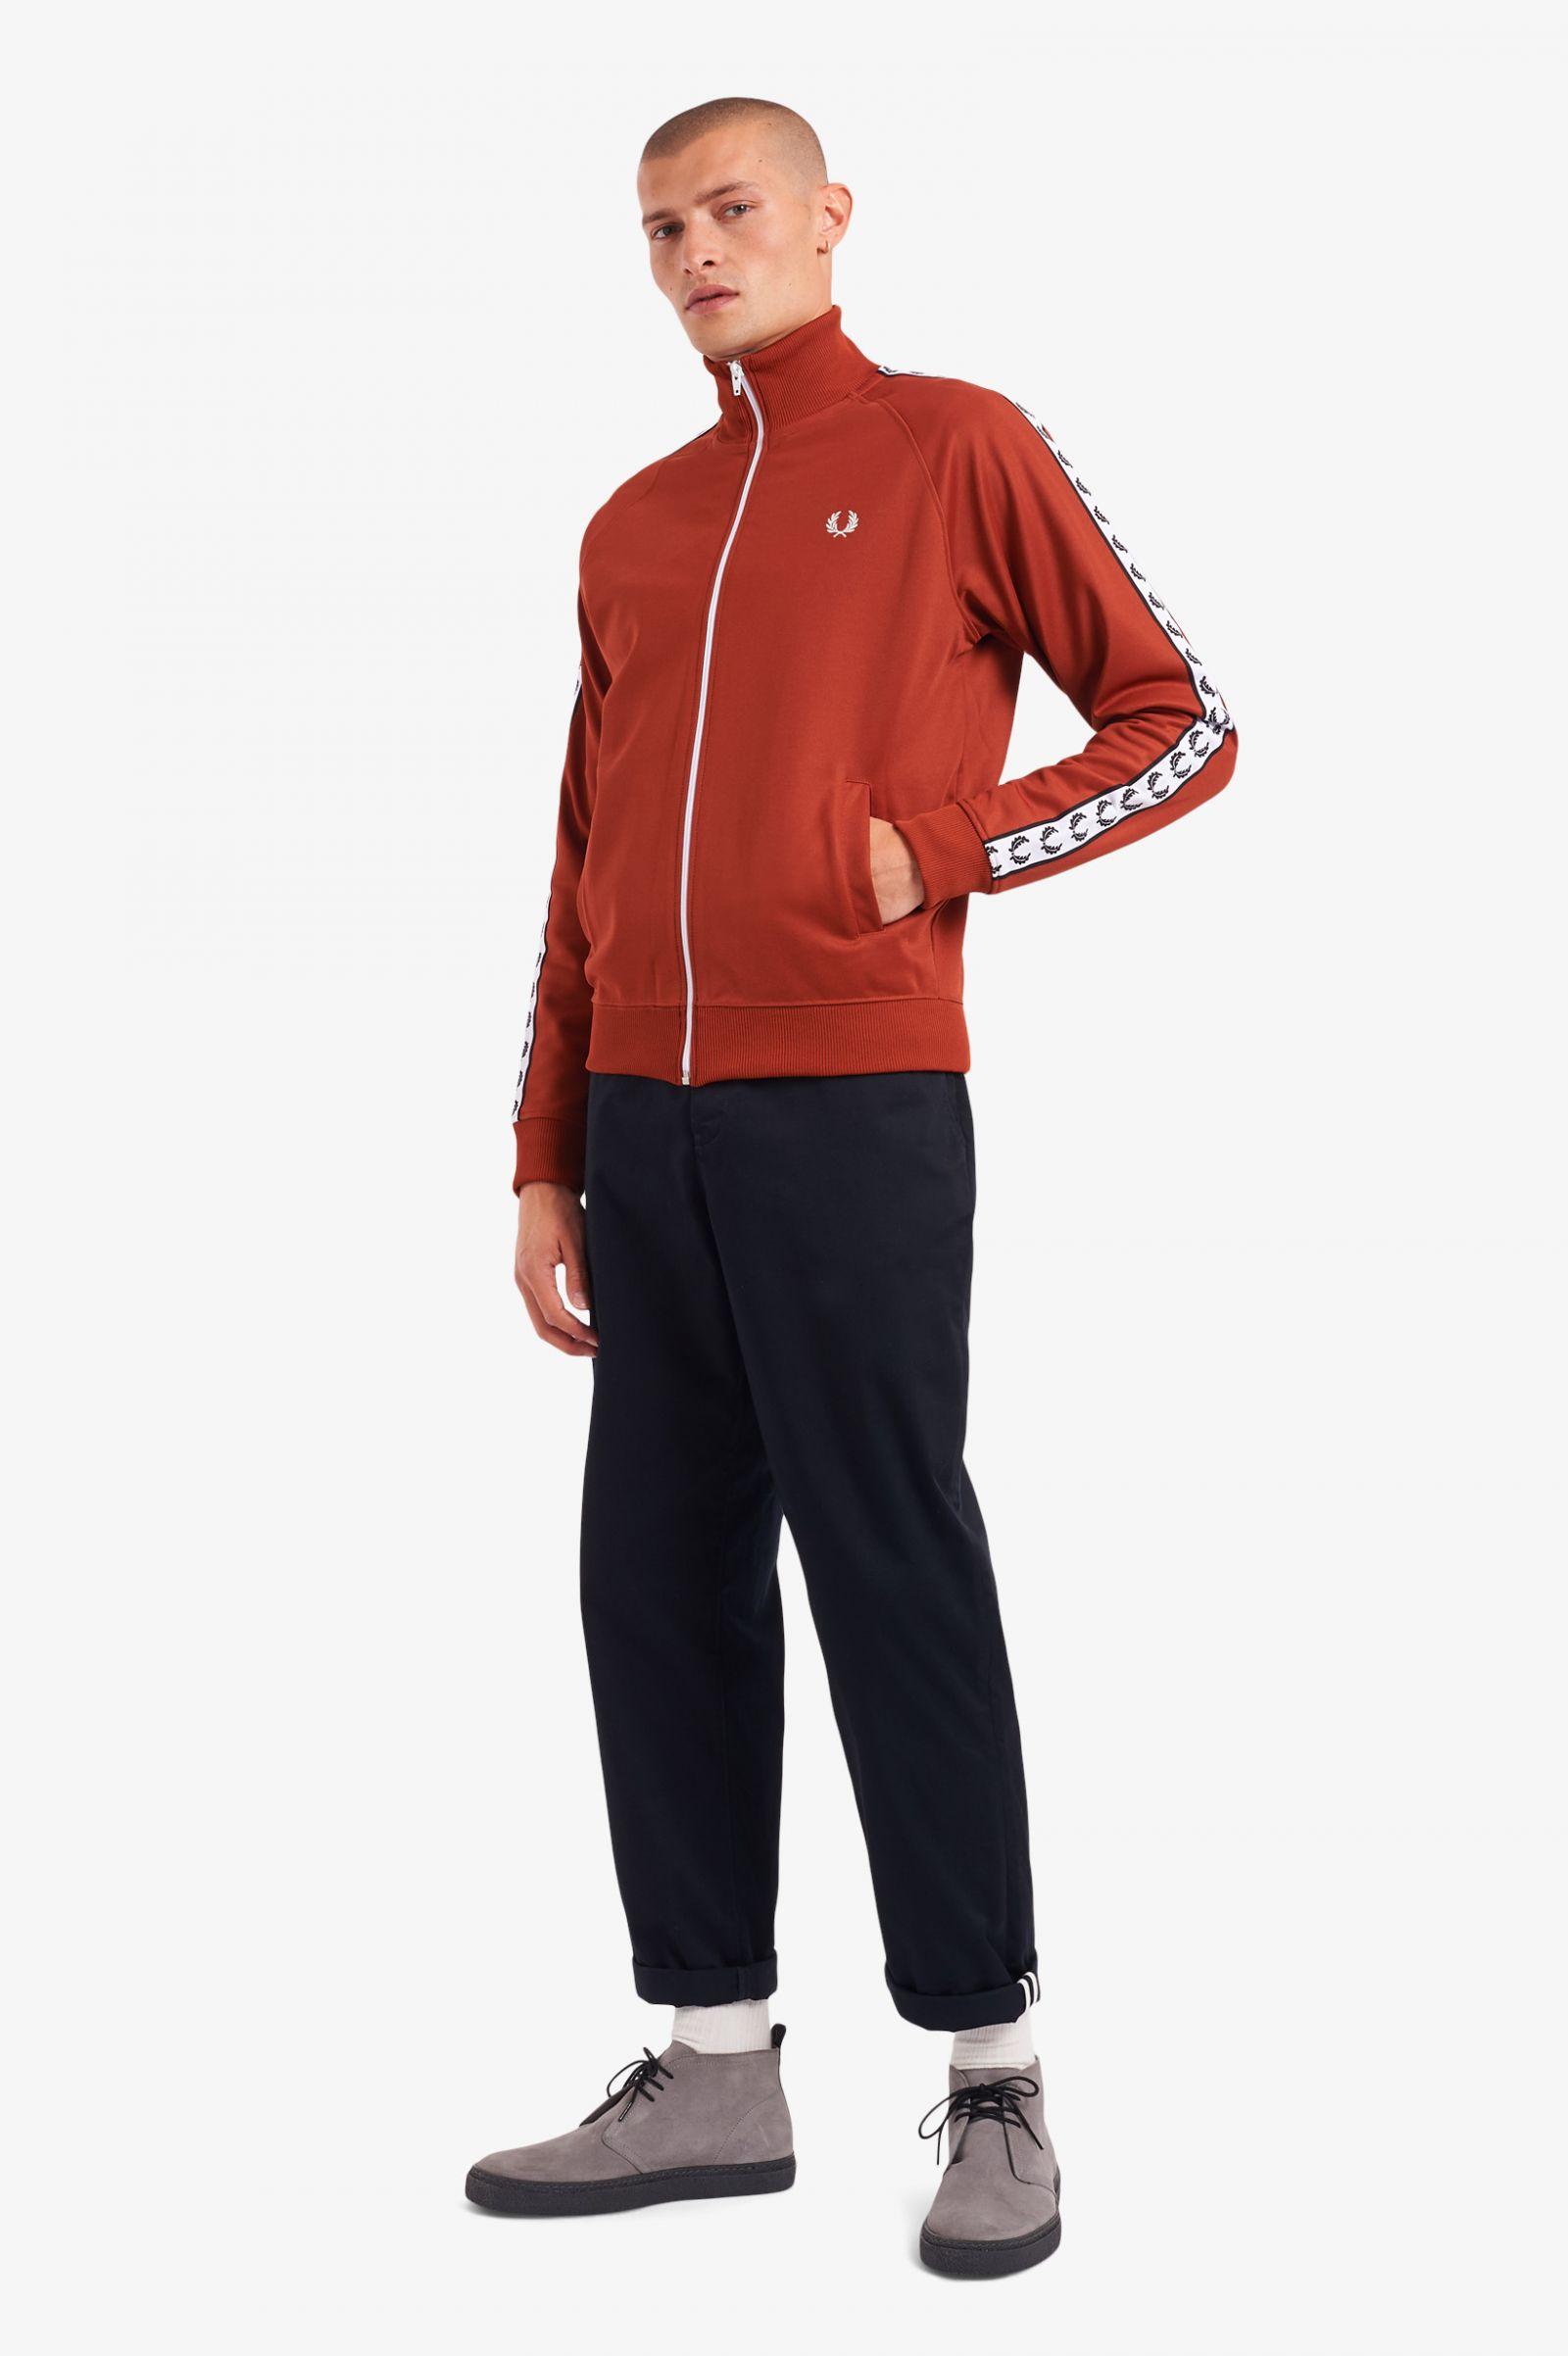 Trainingsjacke mit Sportband Schwarz   Trainingsjacken für